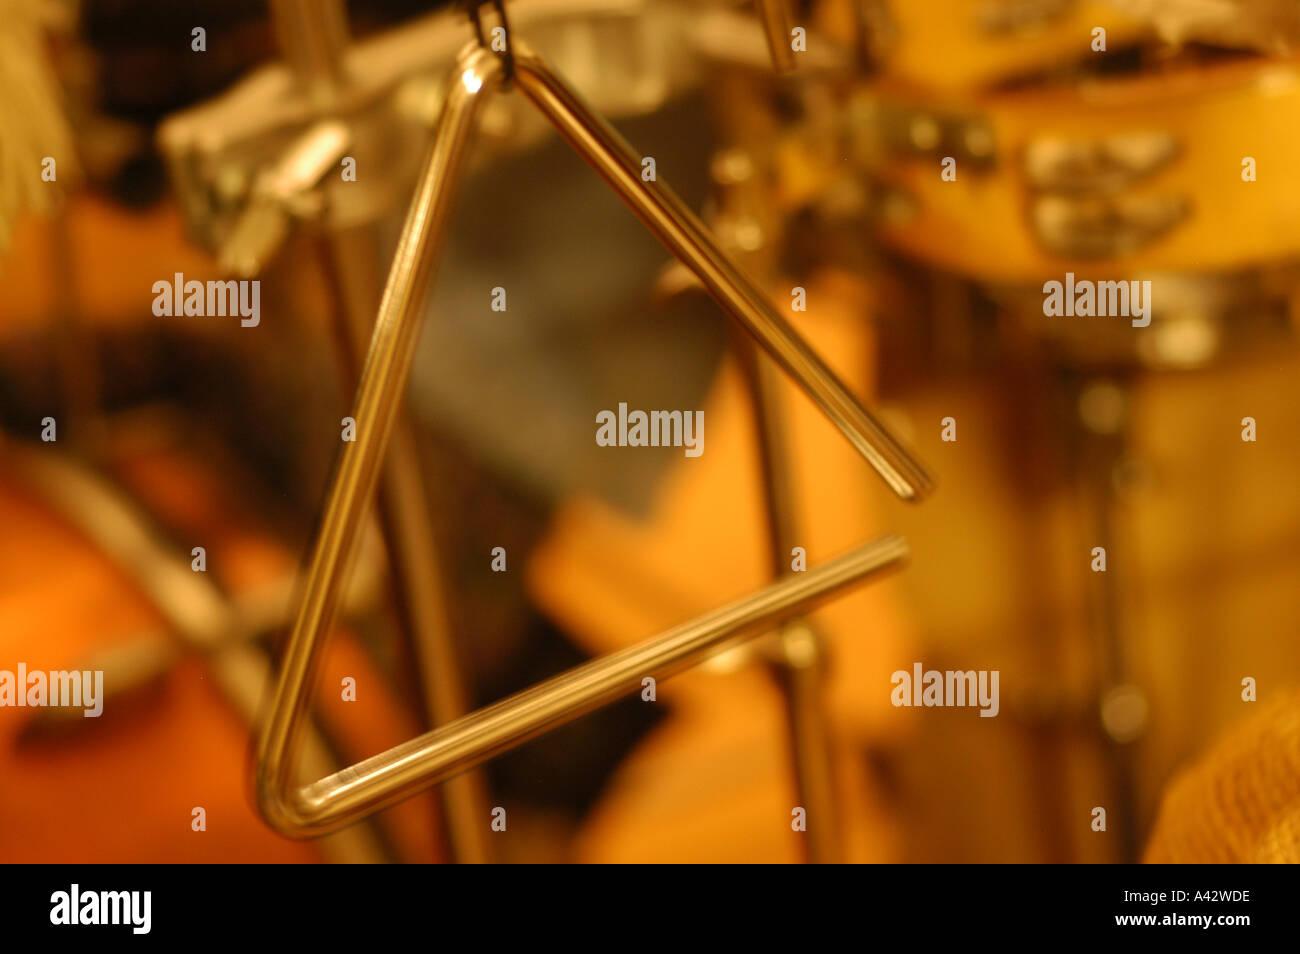 triangle - Stock Image